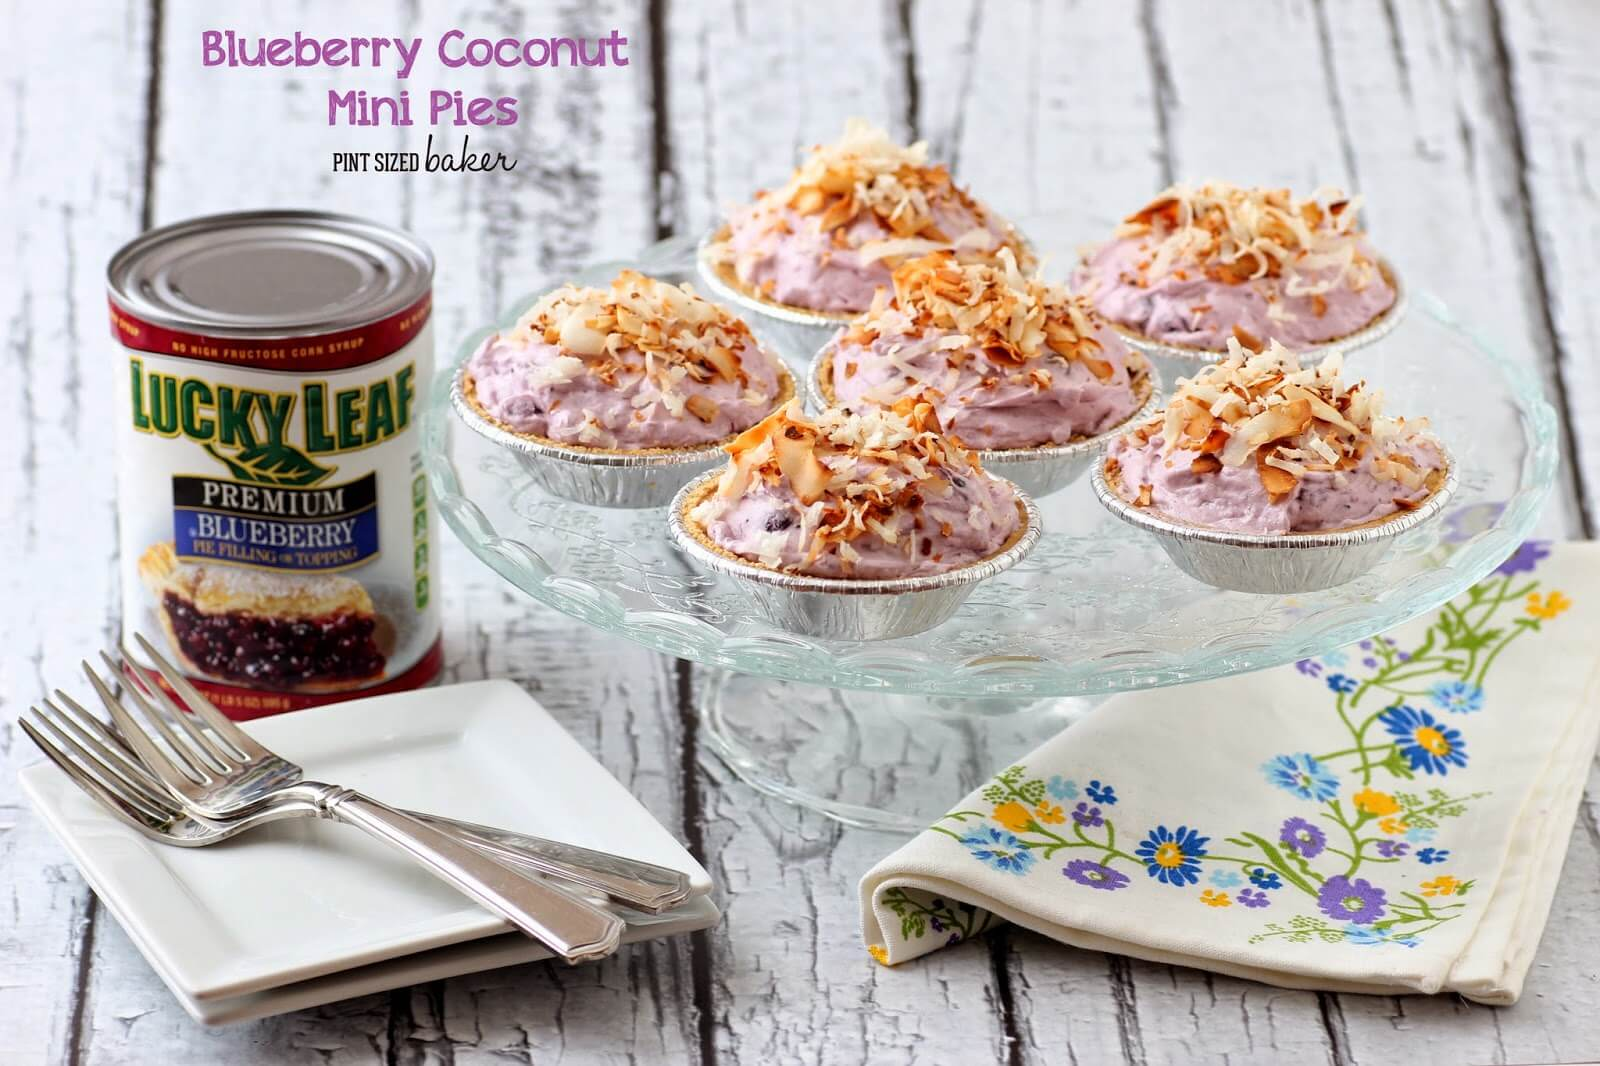 Blueberry Coconut Mini Pies